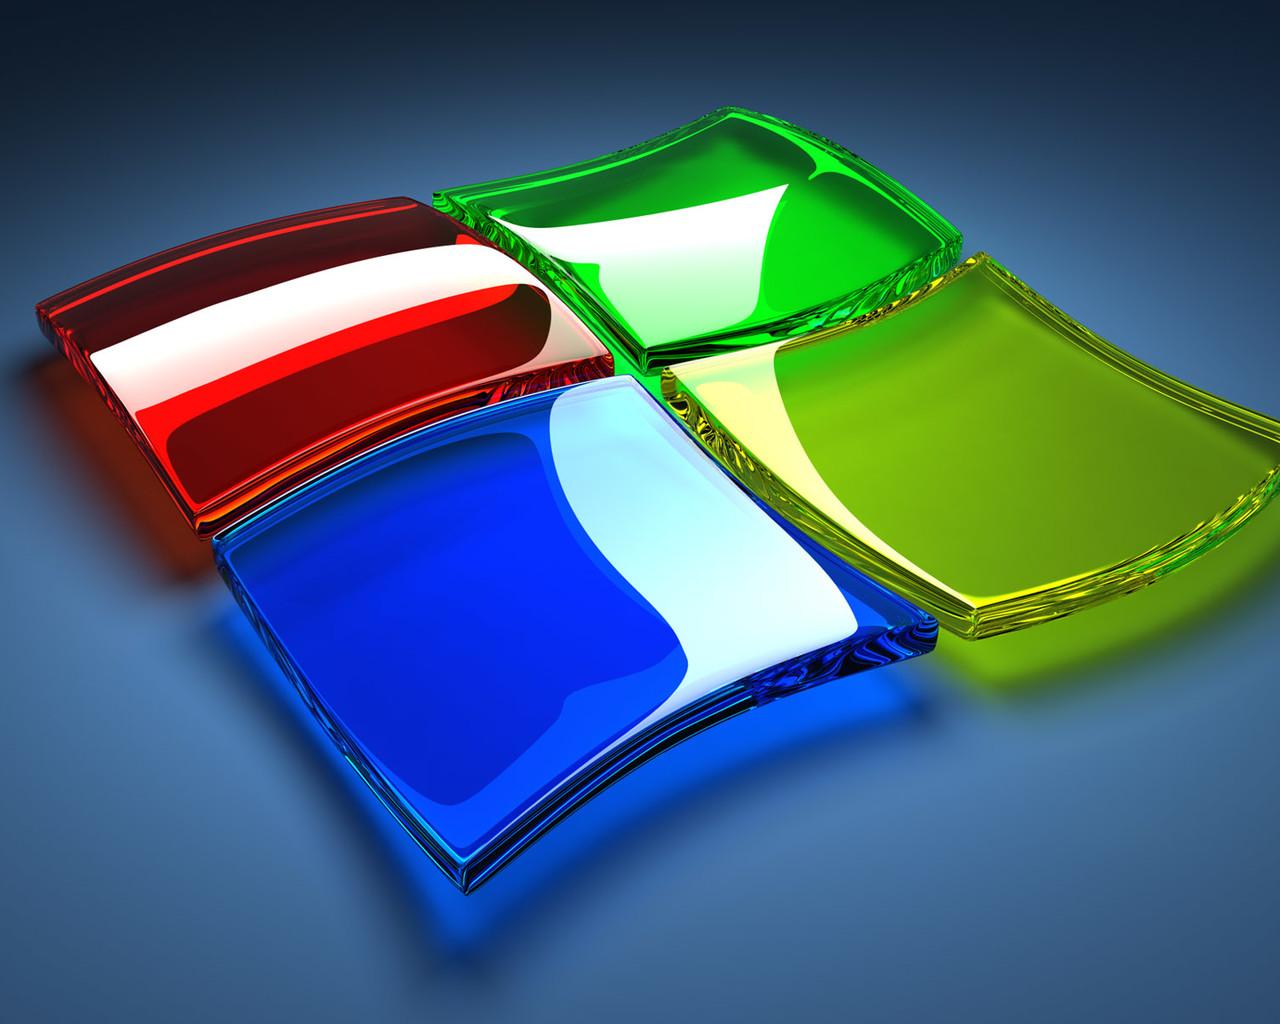 3d Wallpaper 3d Wallpapers For Windows 7